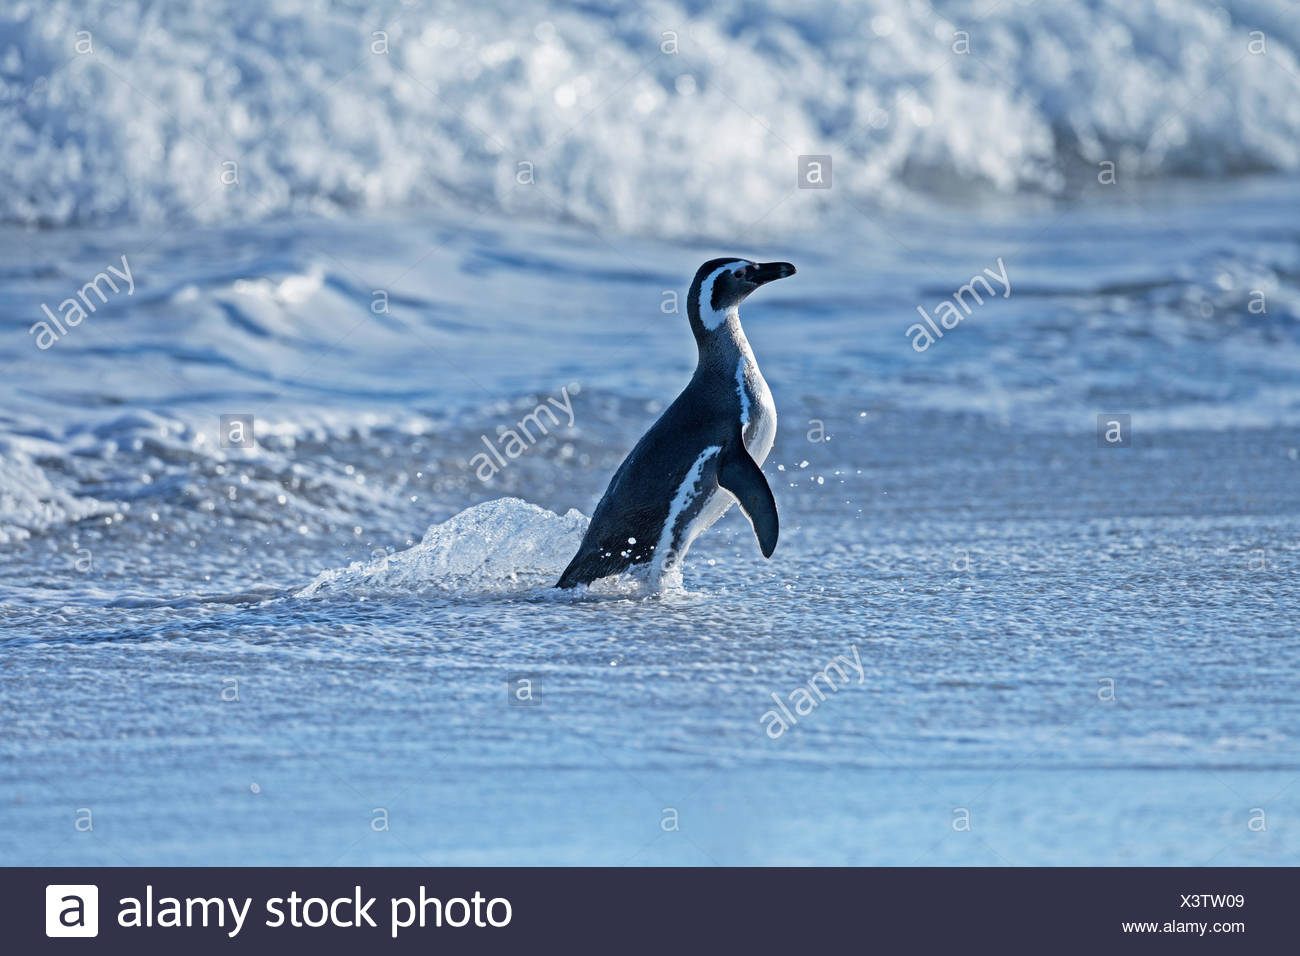 Magellanic Penguin (Spheniscus magellanicus) coming out of water, Sea Lion Island, South Atlantic, Falkland Islands - Stock Image